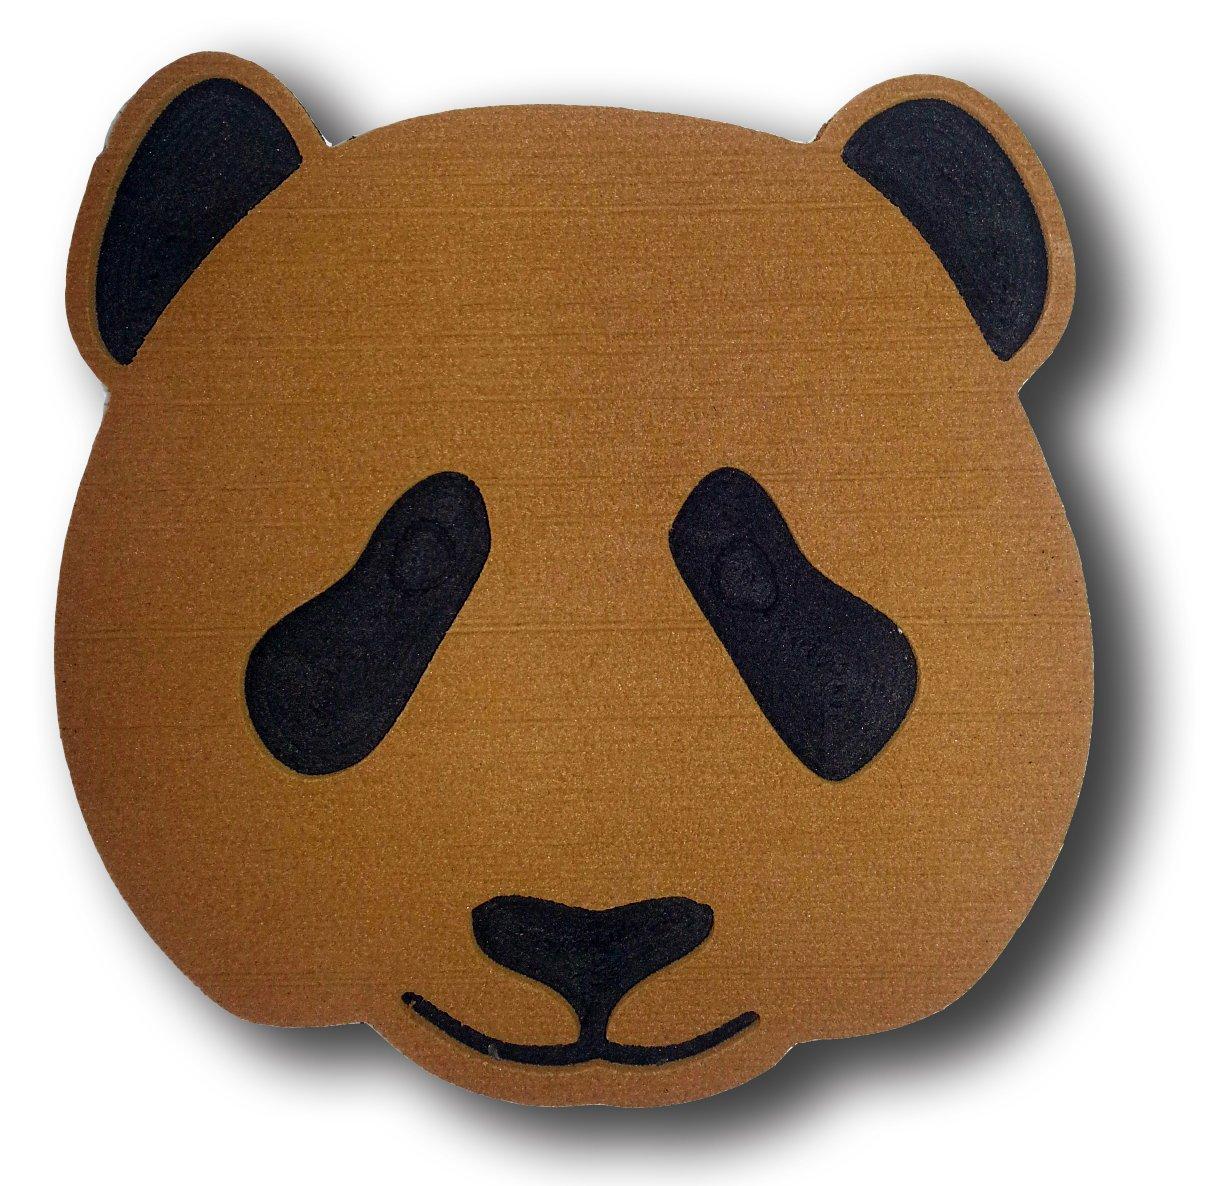 ToeJamR Stomp Pad - PANDA BEAR FACE - Brown